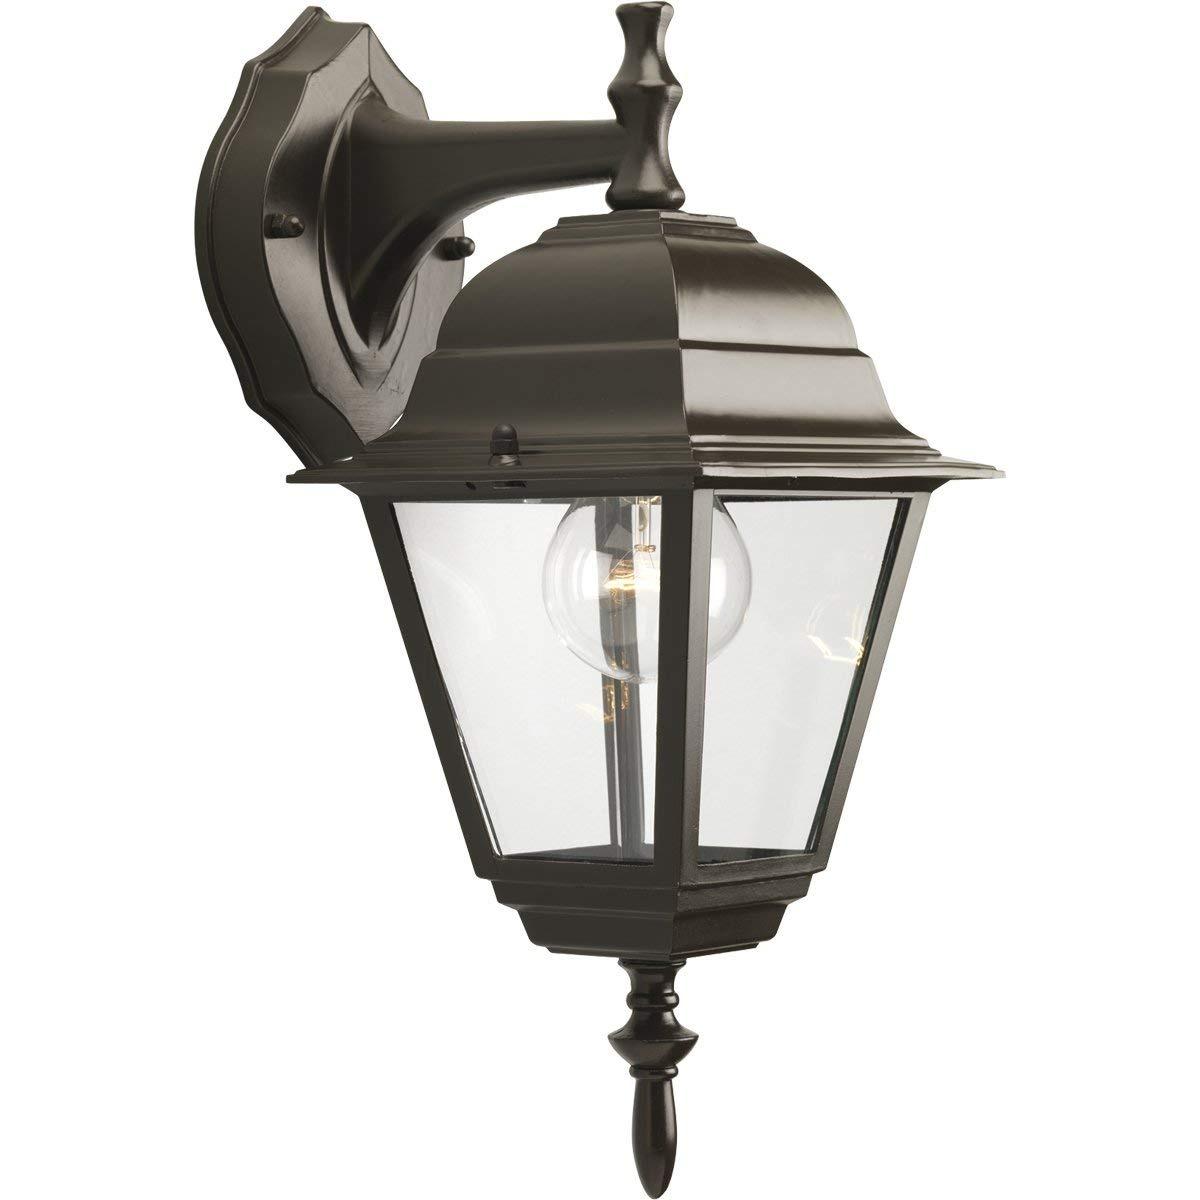 125 One Light Small Wall Lantern Down